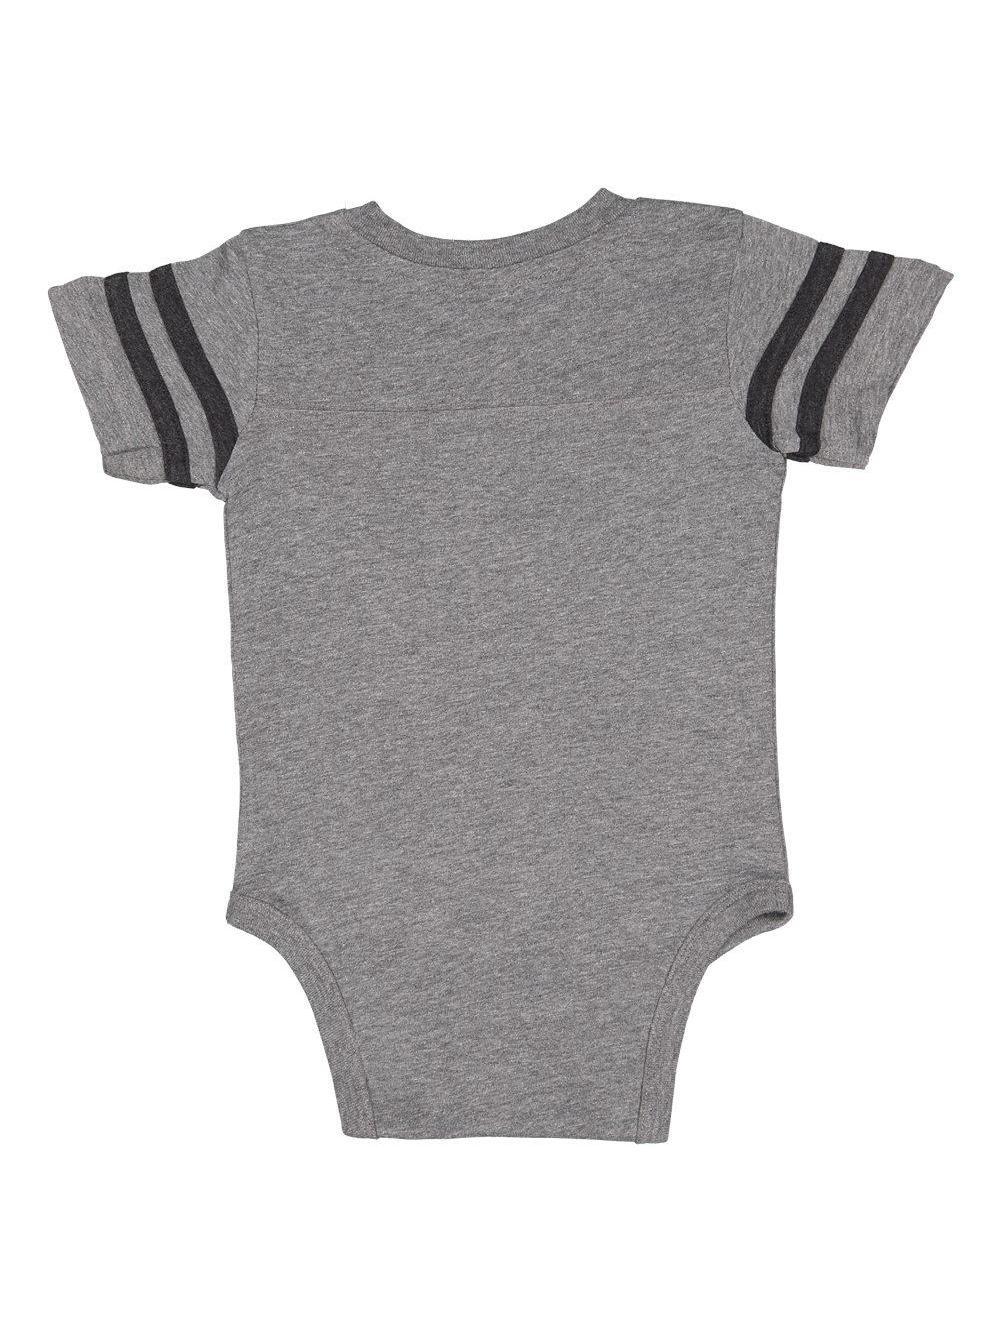 7f00c2e56b0 Rabbit Skins - Infant Football Fine Jersey Bodysuit - 4437 | eBay